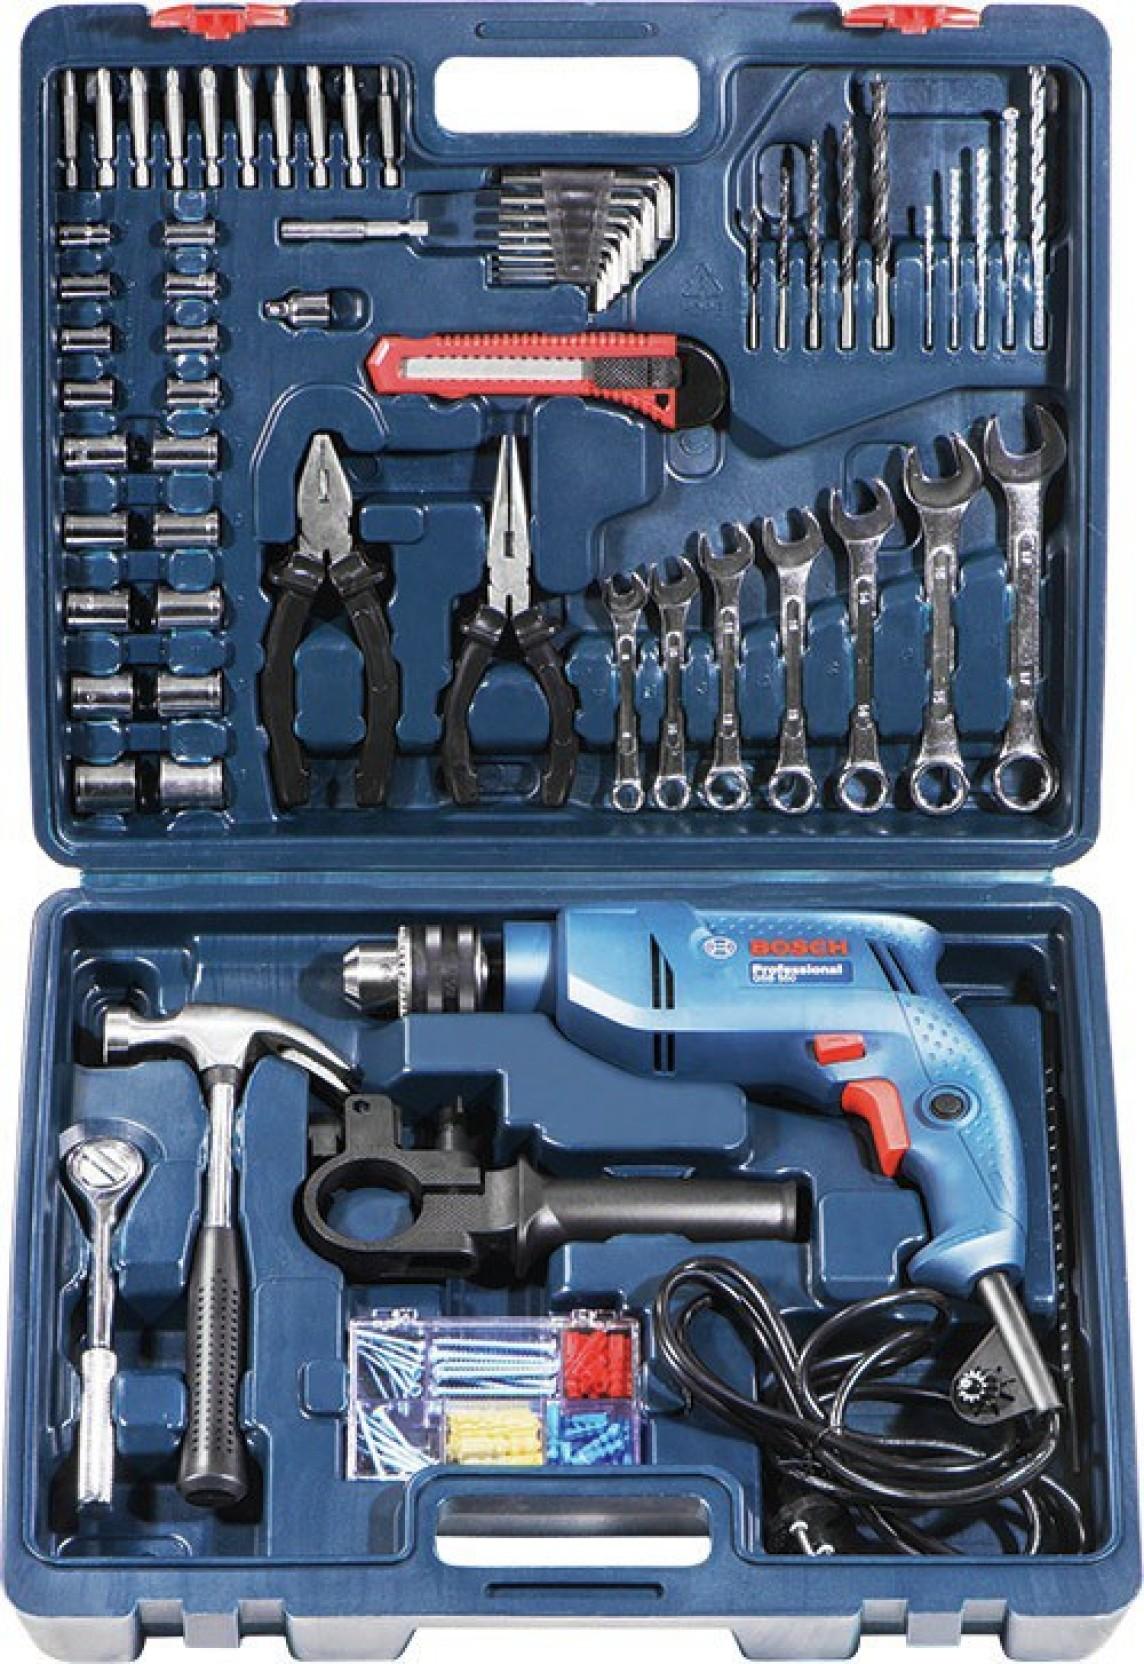 Bosch GSB 550 - Mechanic Power Tool Kit Price in India ...